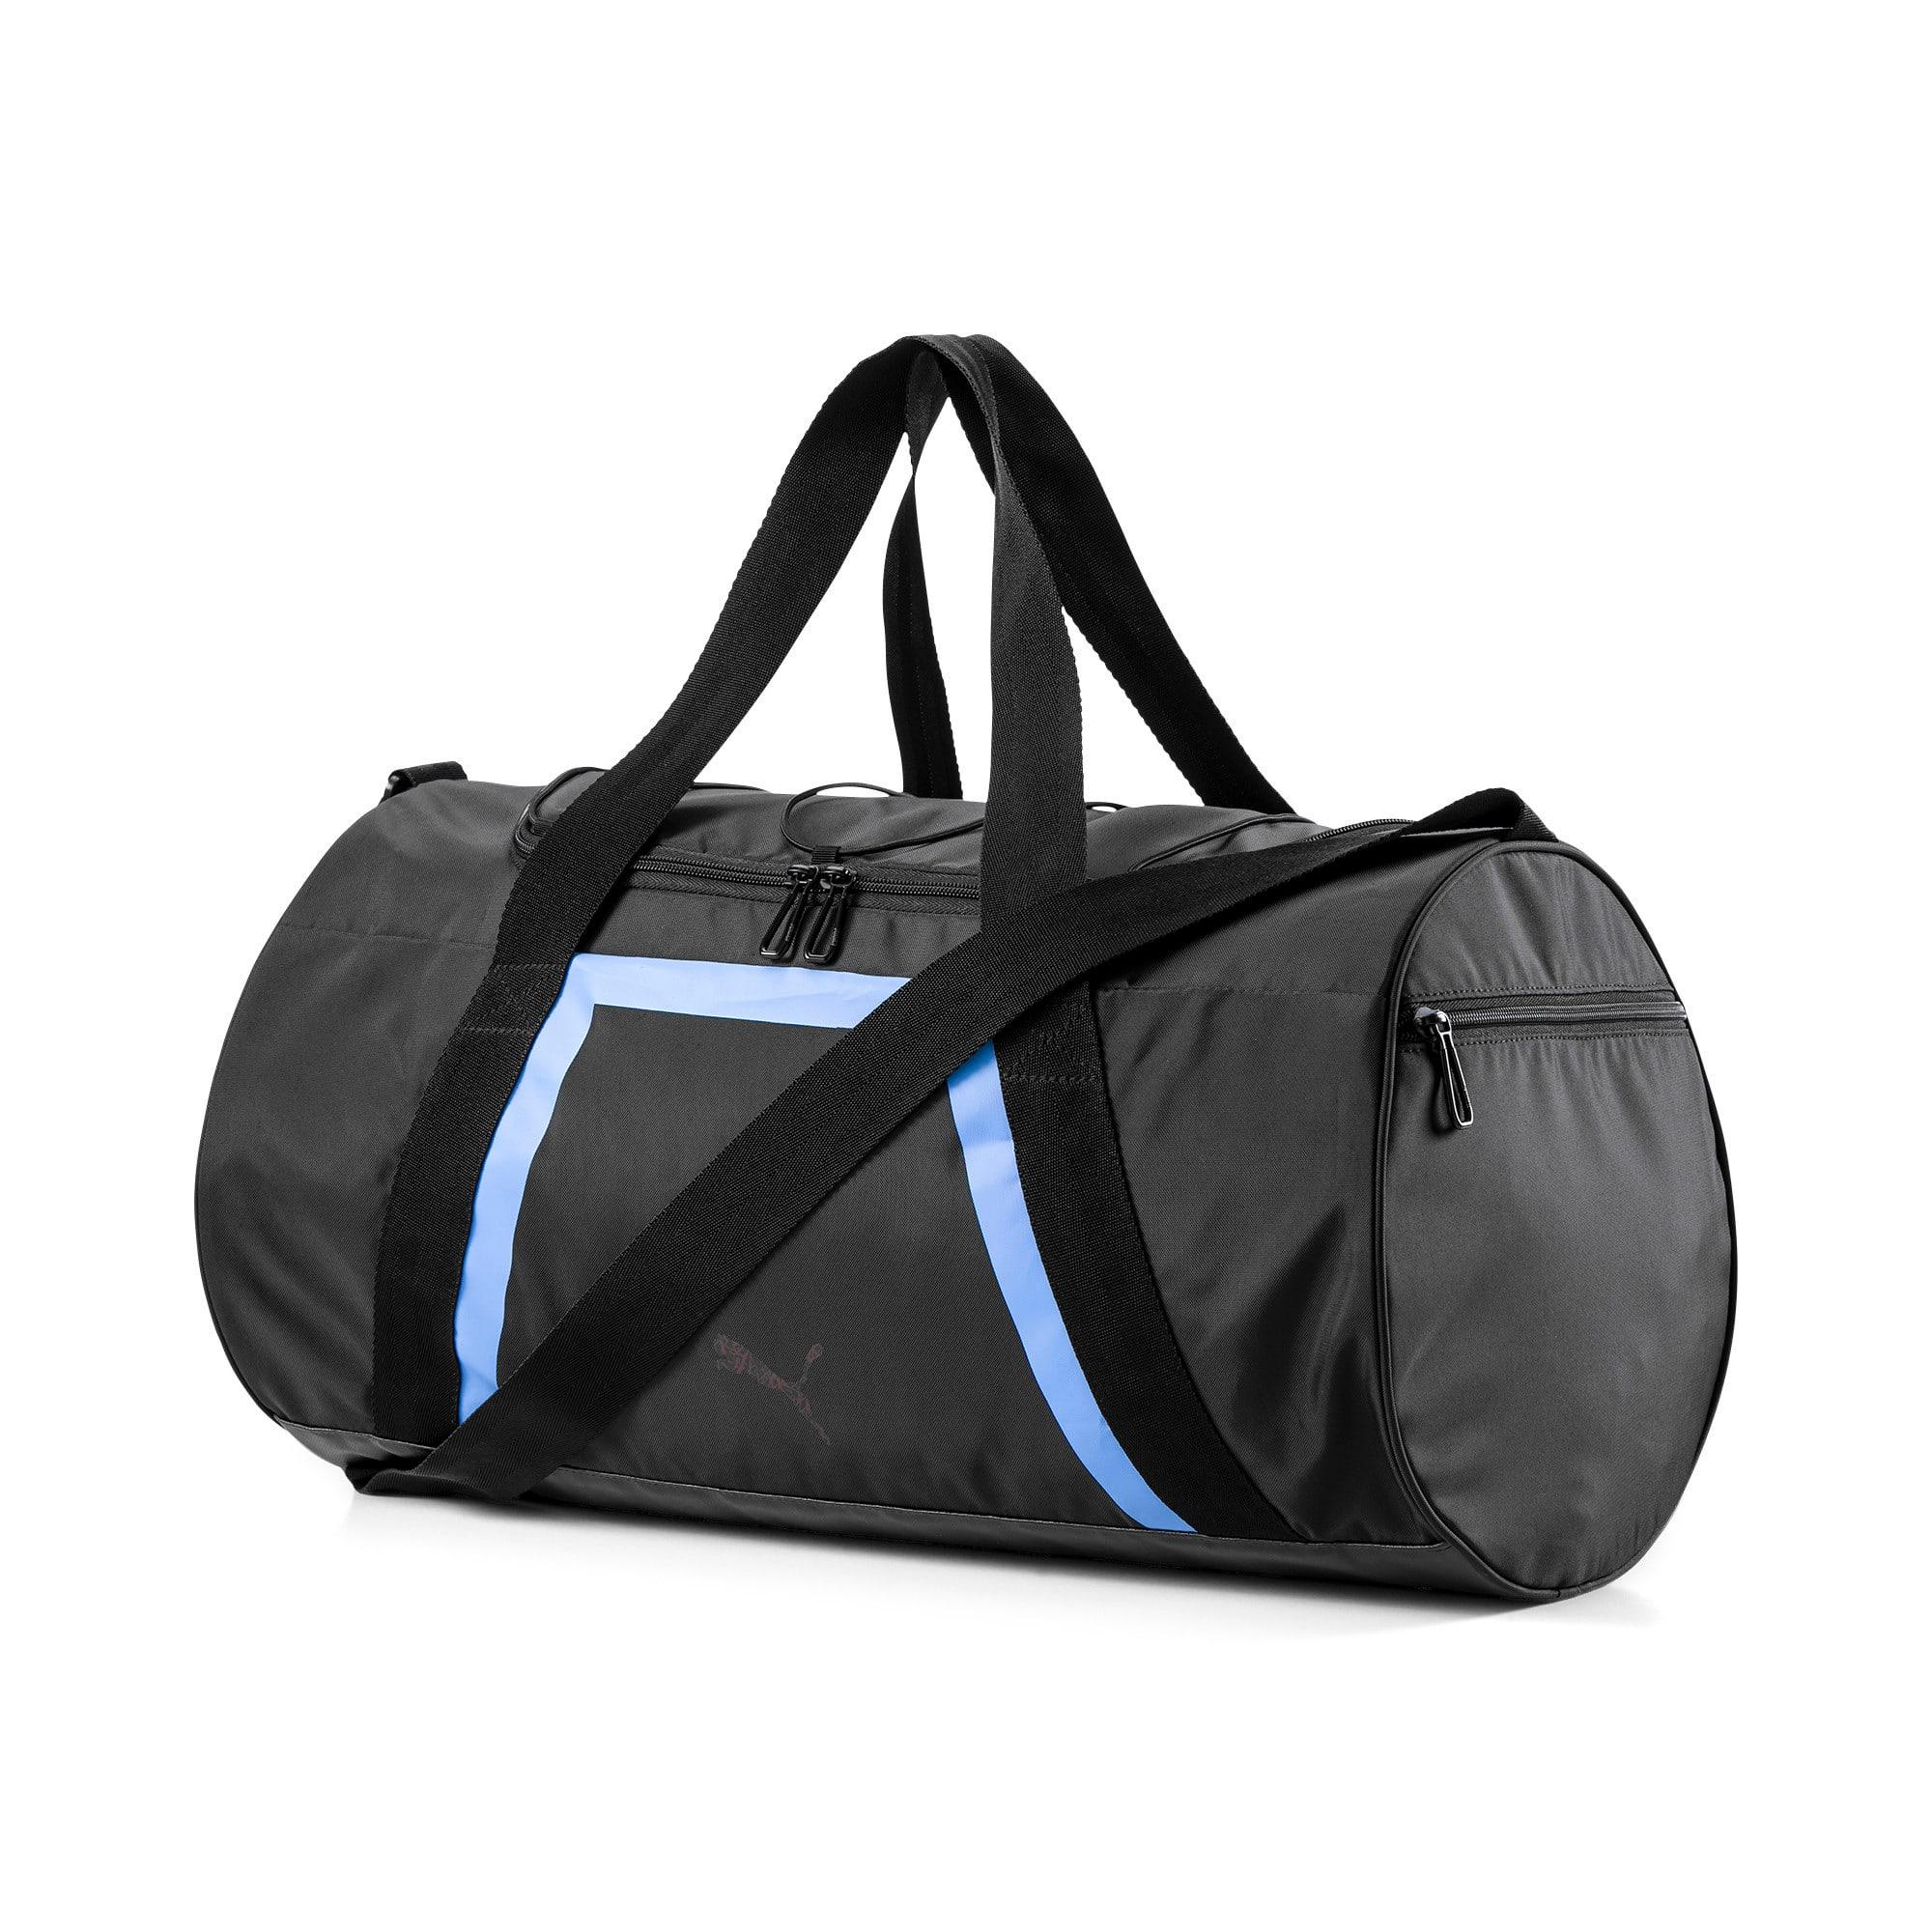 Thumbnail 1 of AT Shift Duffel Bag, Puma Black-Blue Glimmer, medium